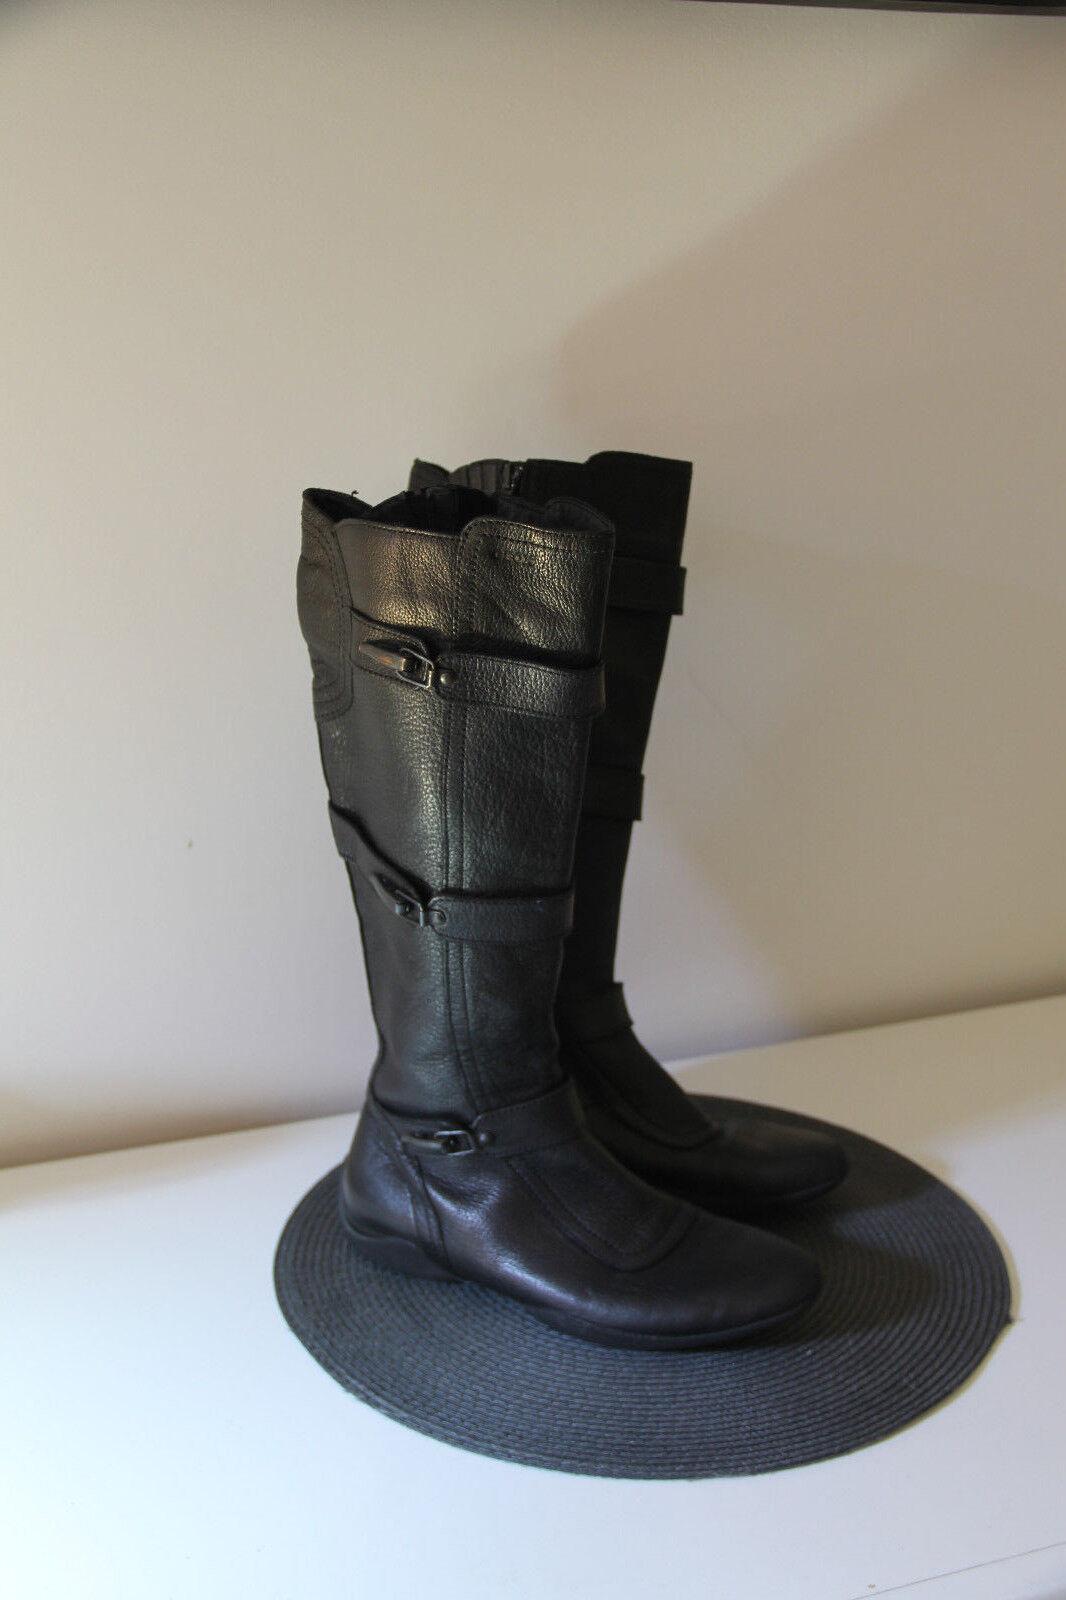 Pretty Stiefel flat schwarz Leder Leder Leder zipped winter GEOX Größe 38 8b5433